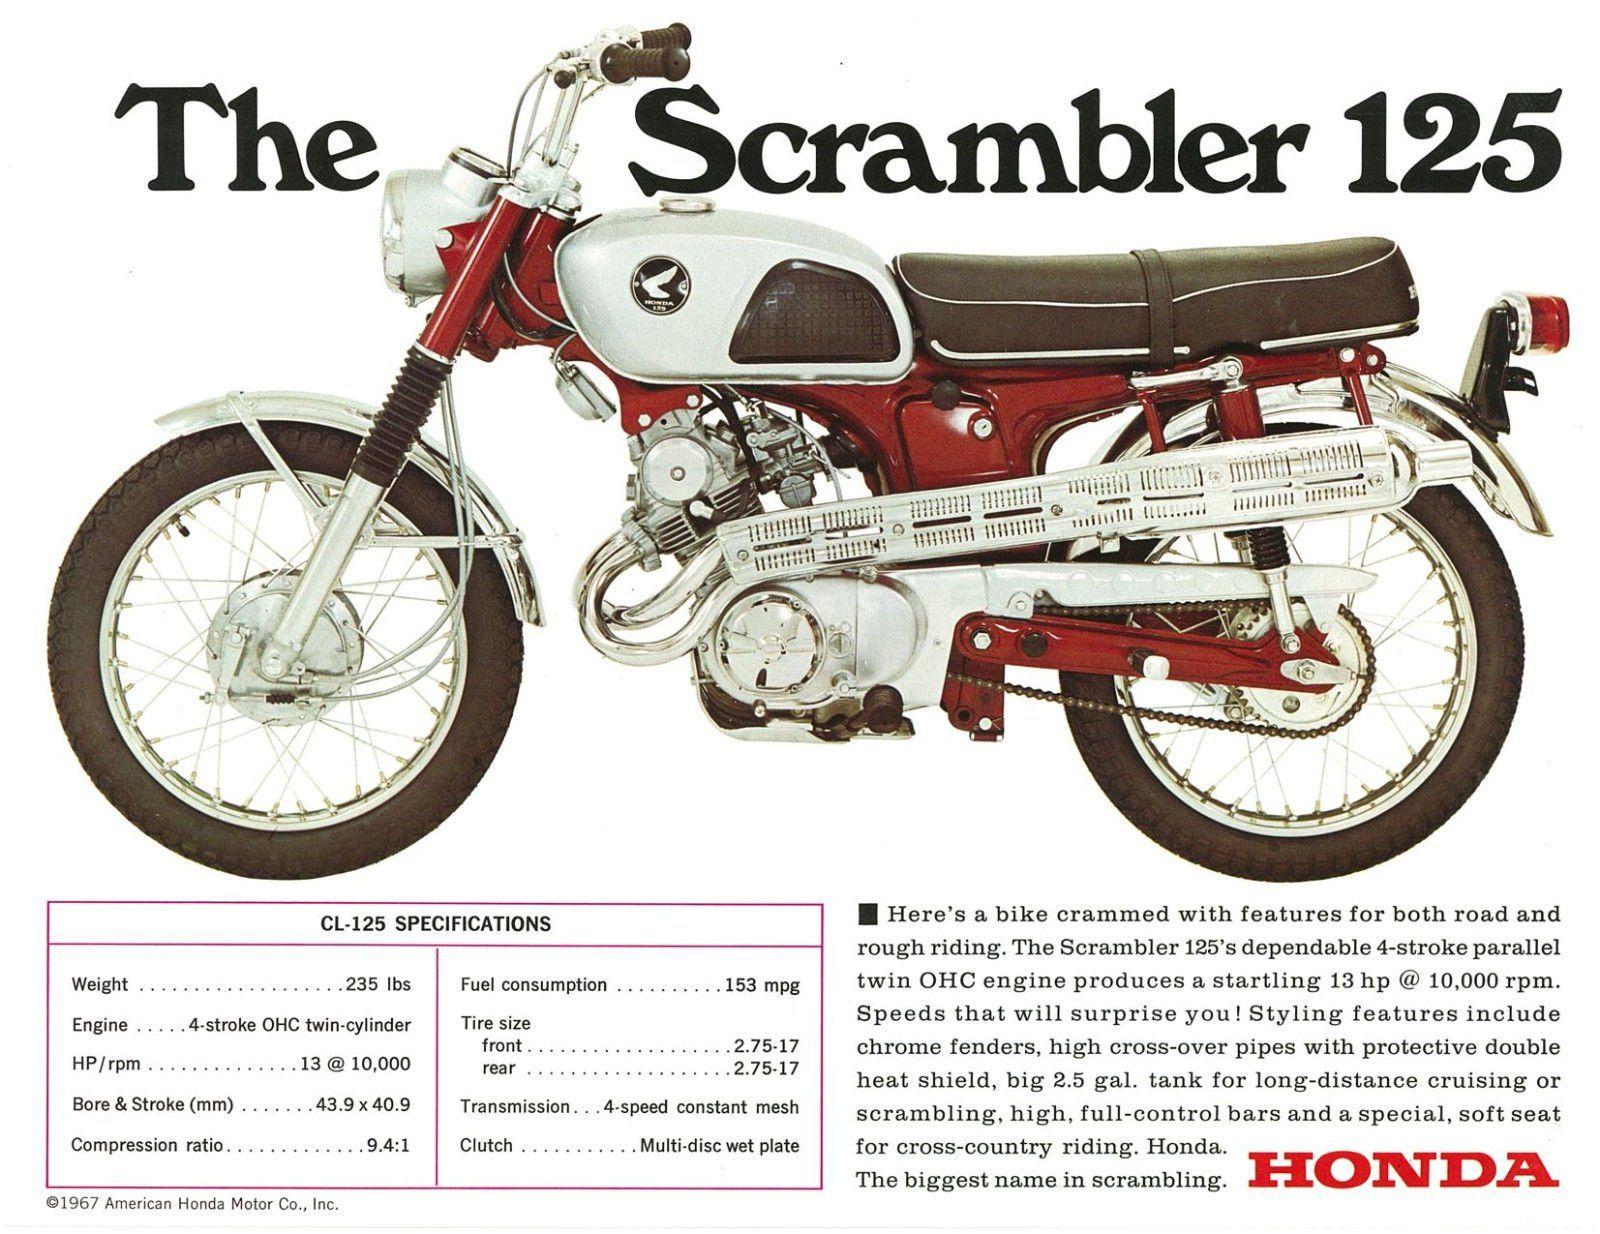 A Brief Guide To Honda Scramblers Updated For 2019 Honda Scrambler Vintage Honda Motorcycles Honda Motorcycles [ 1234 x 1600 Pixel ]